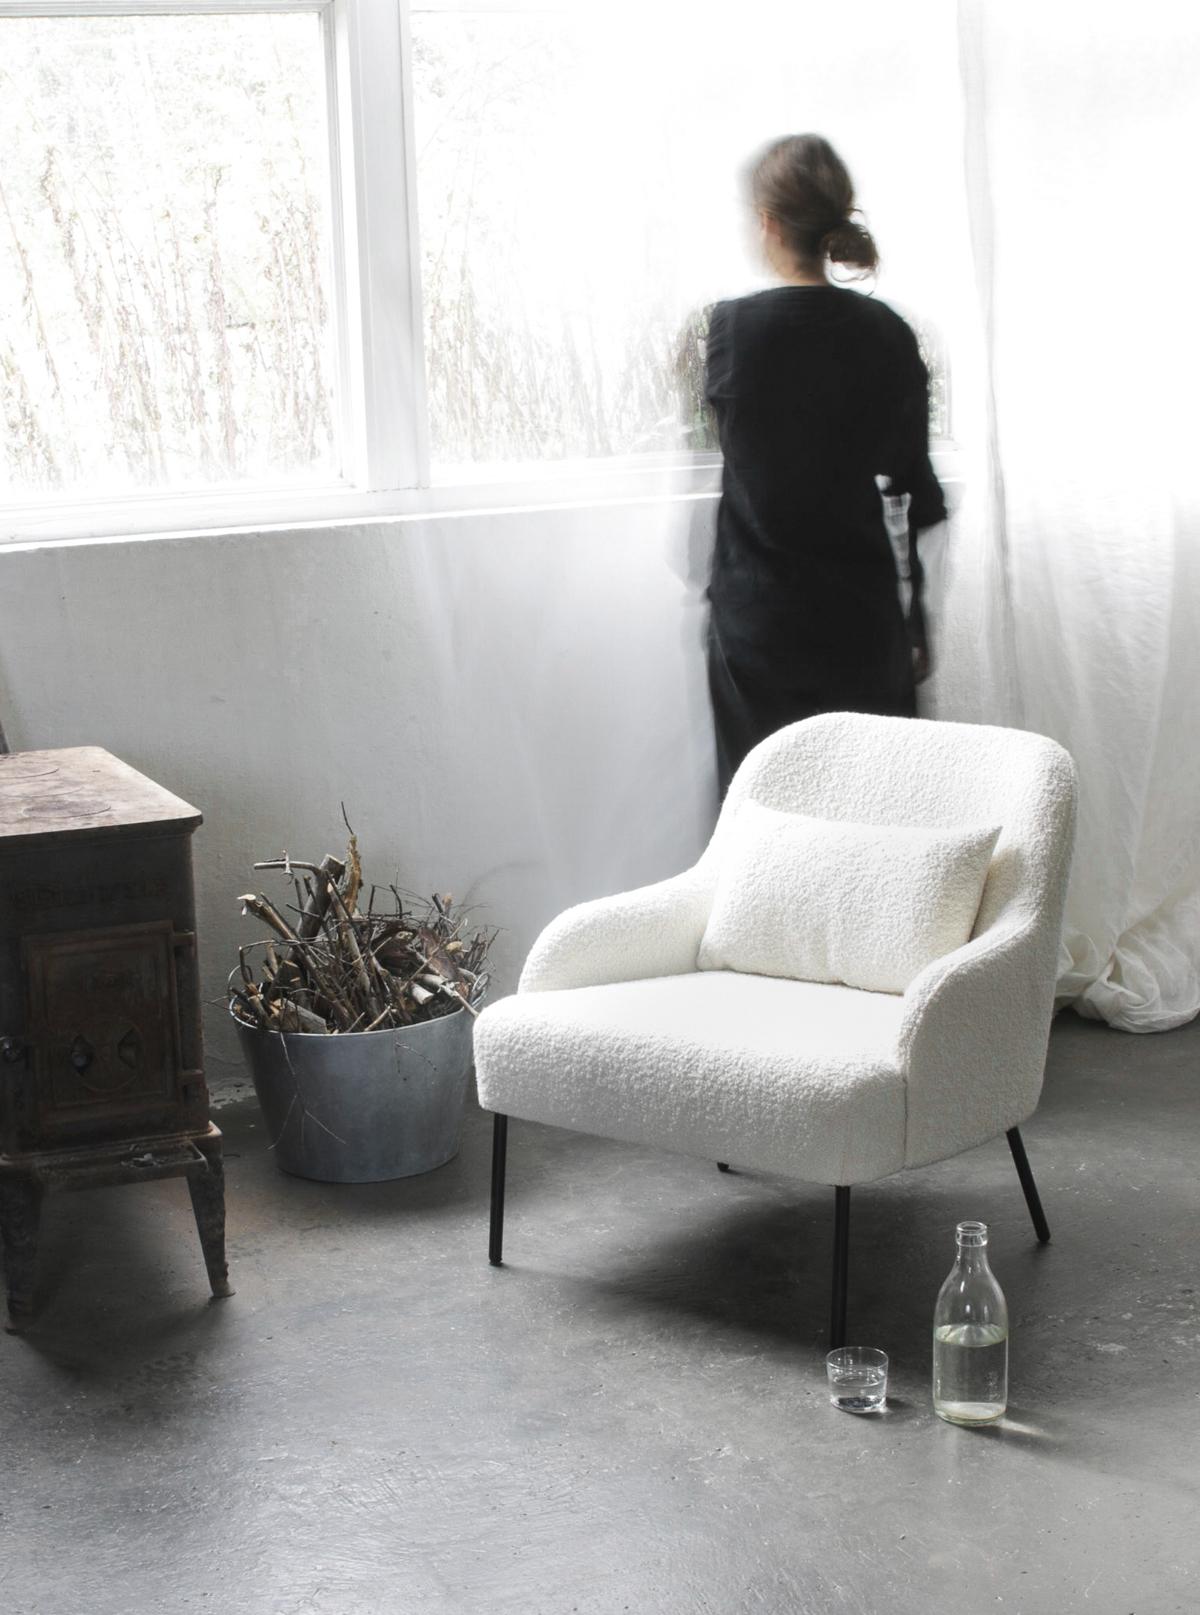 2K2H_Vika_lounge_chair_stol_01a_yggoglyng